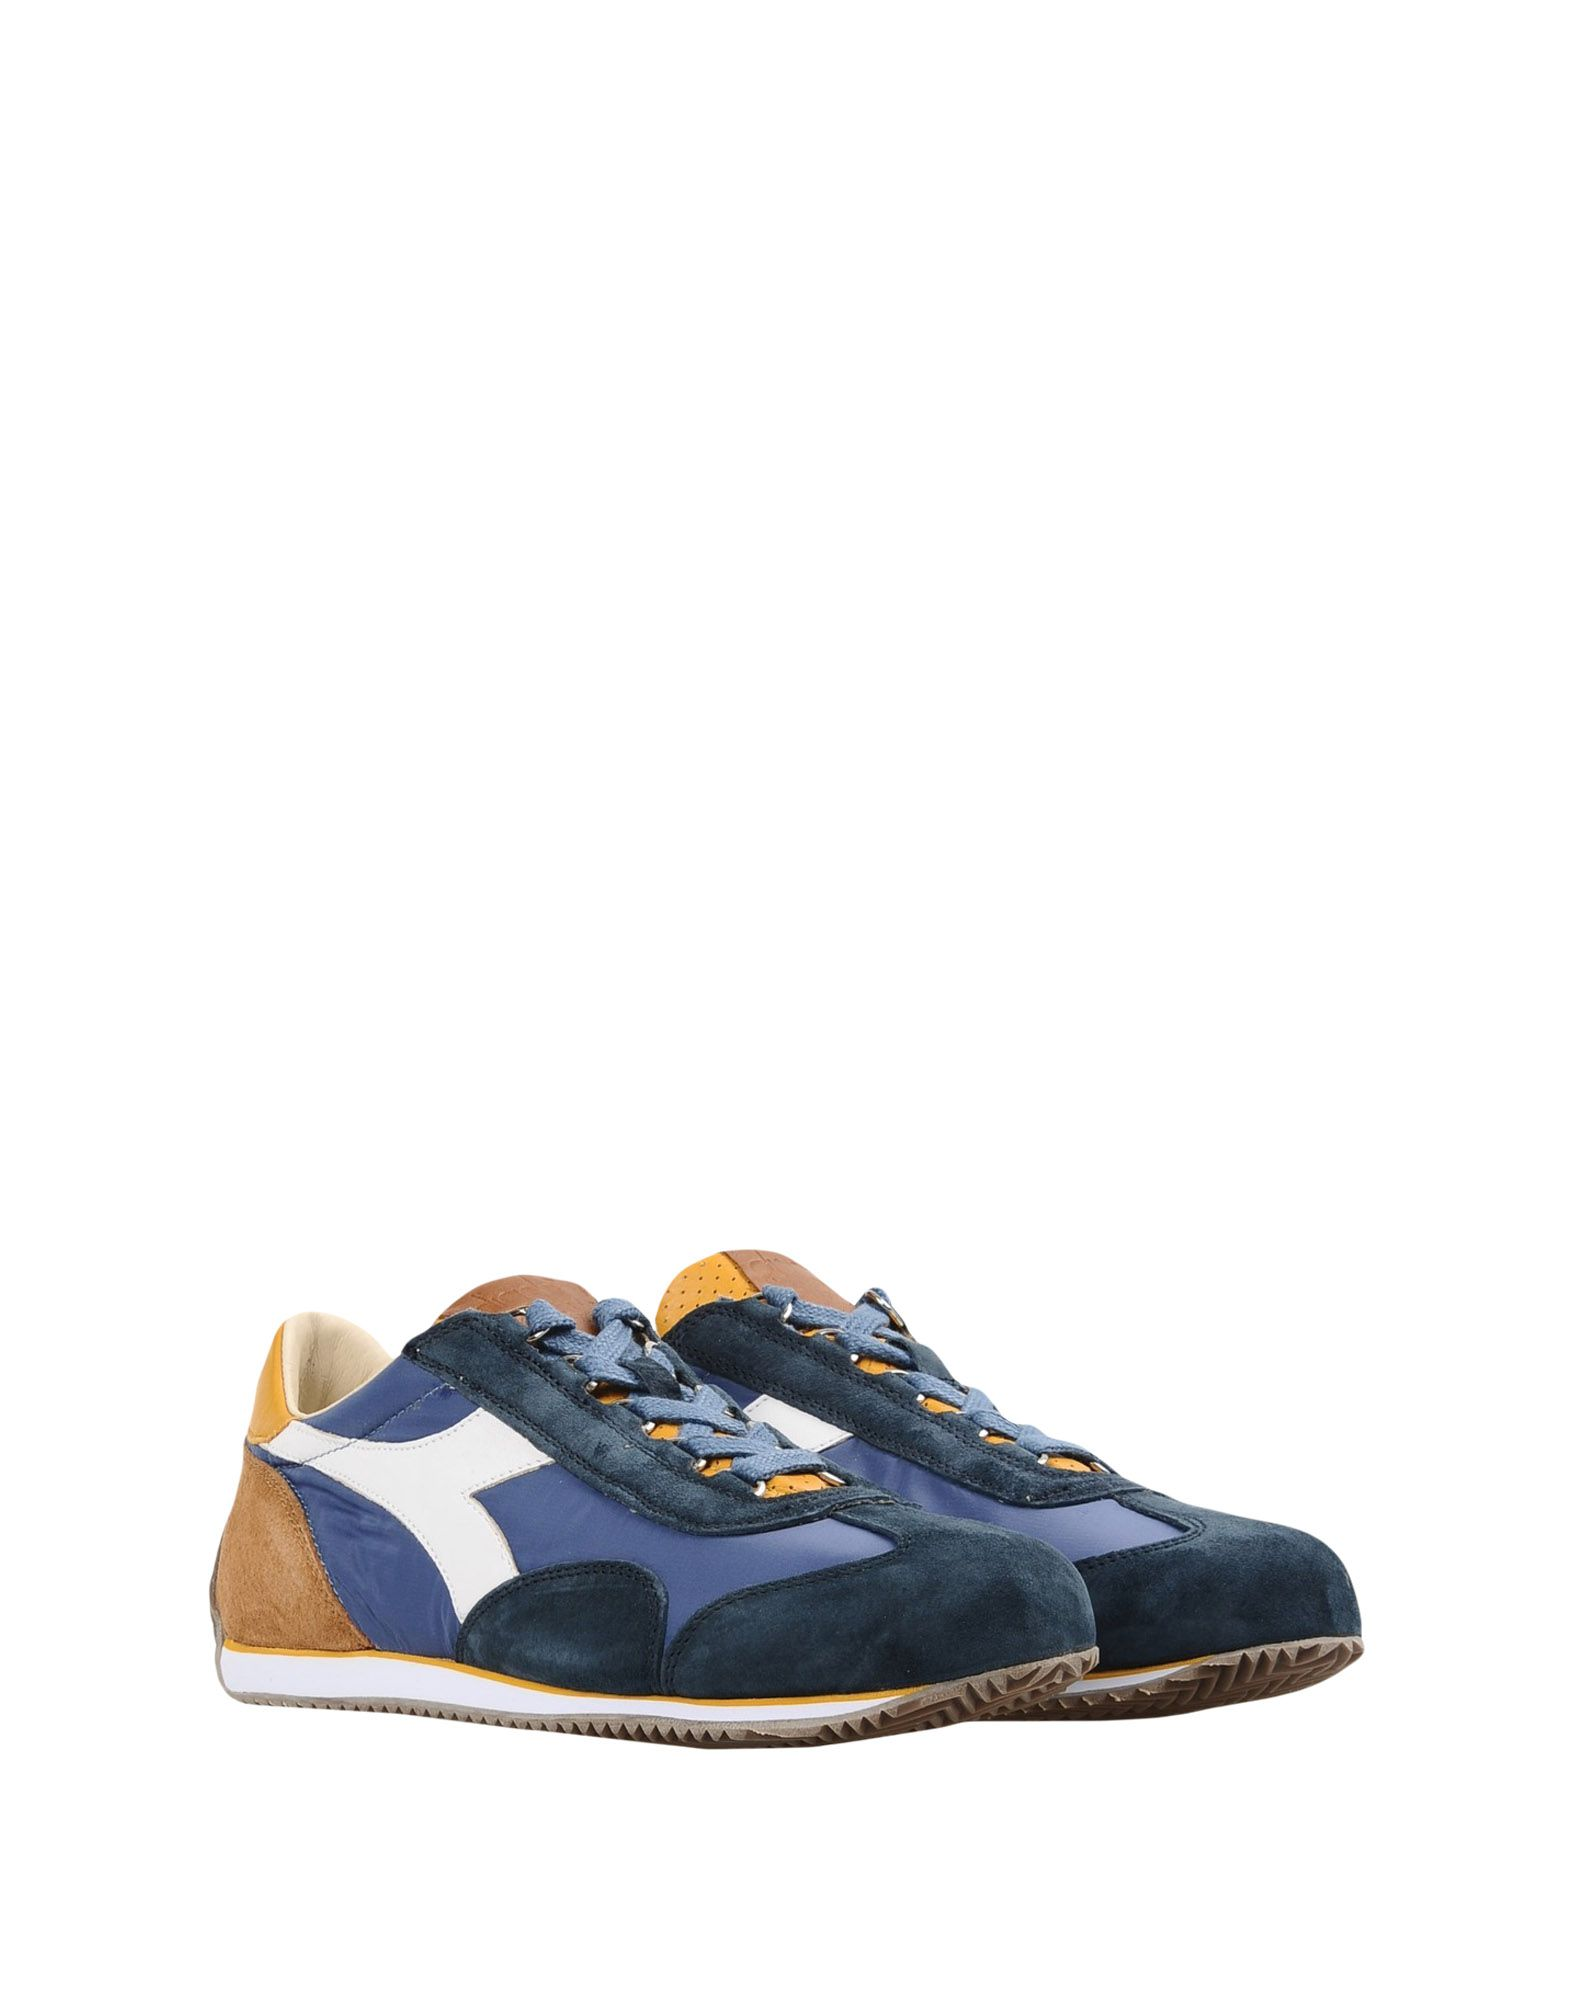 Sneakers Diadora Heritage Equipe Ita - Homme - Sneakers Diadora Heritage sur